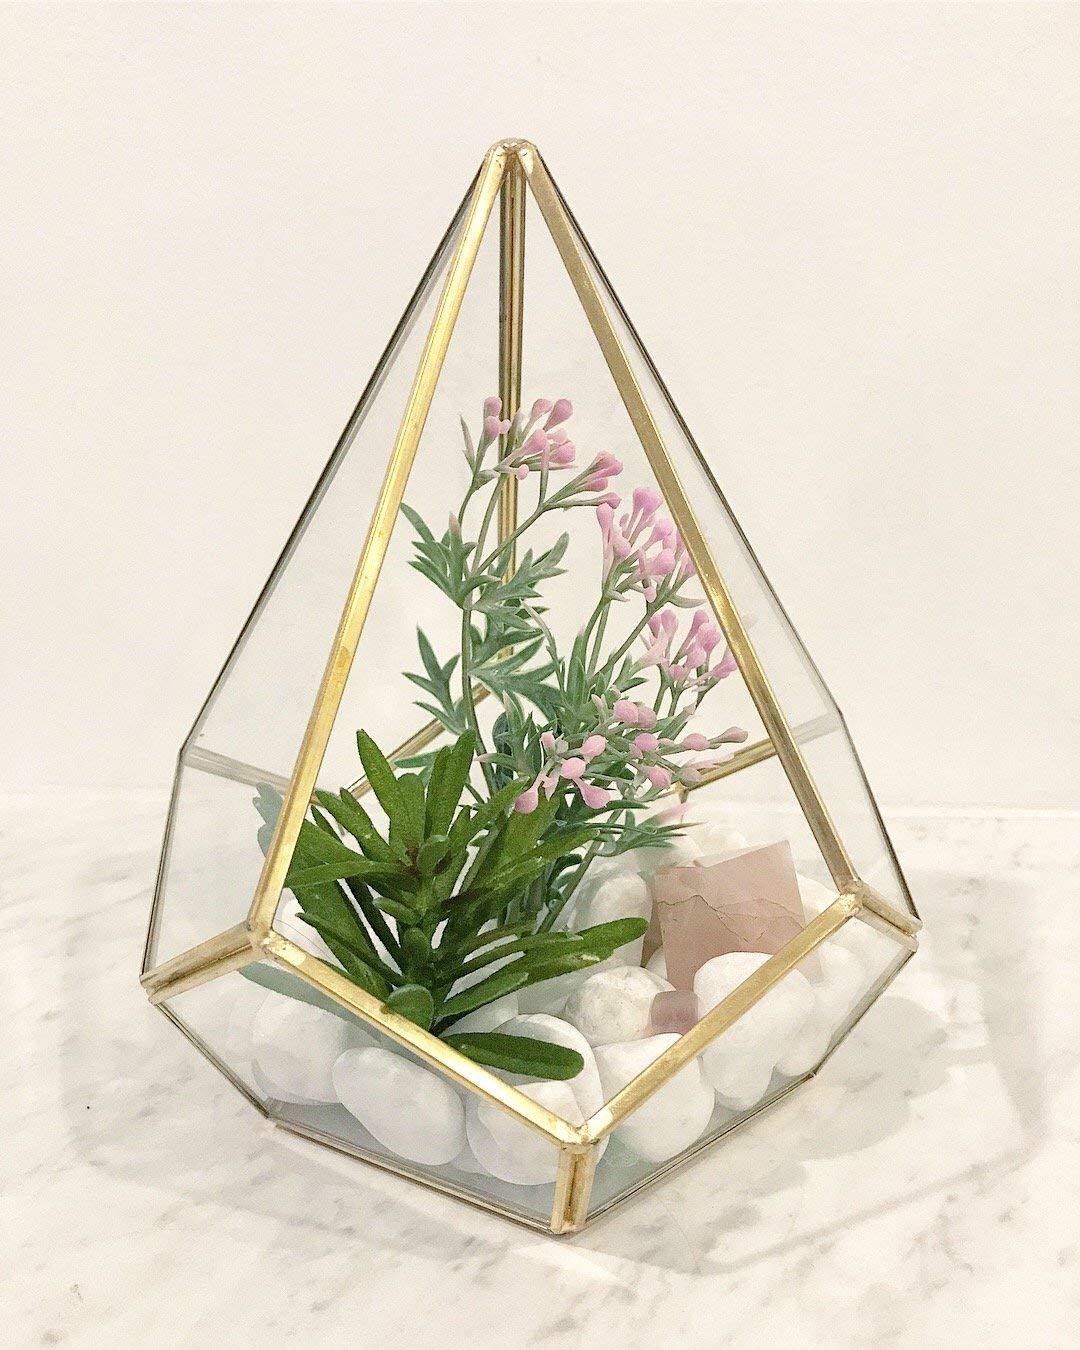 Cheap Succulent Terrarium Find Succulent Terrarium Deals On Line At Alibaba Com